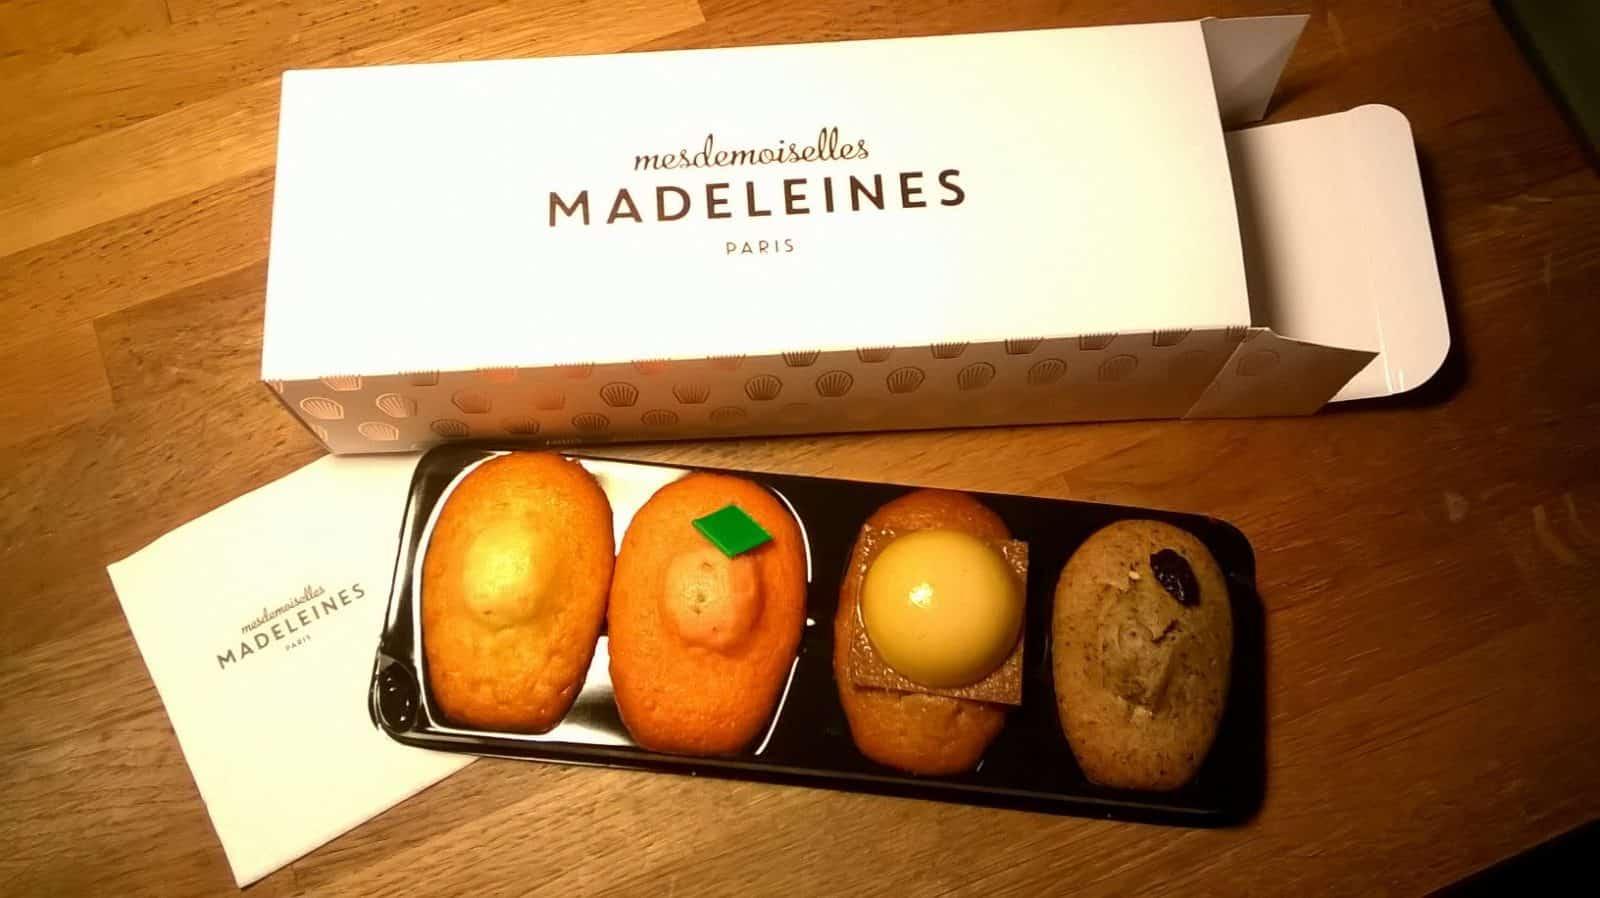 mesdemoiselles-madeleines-paris